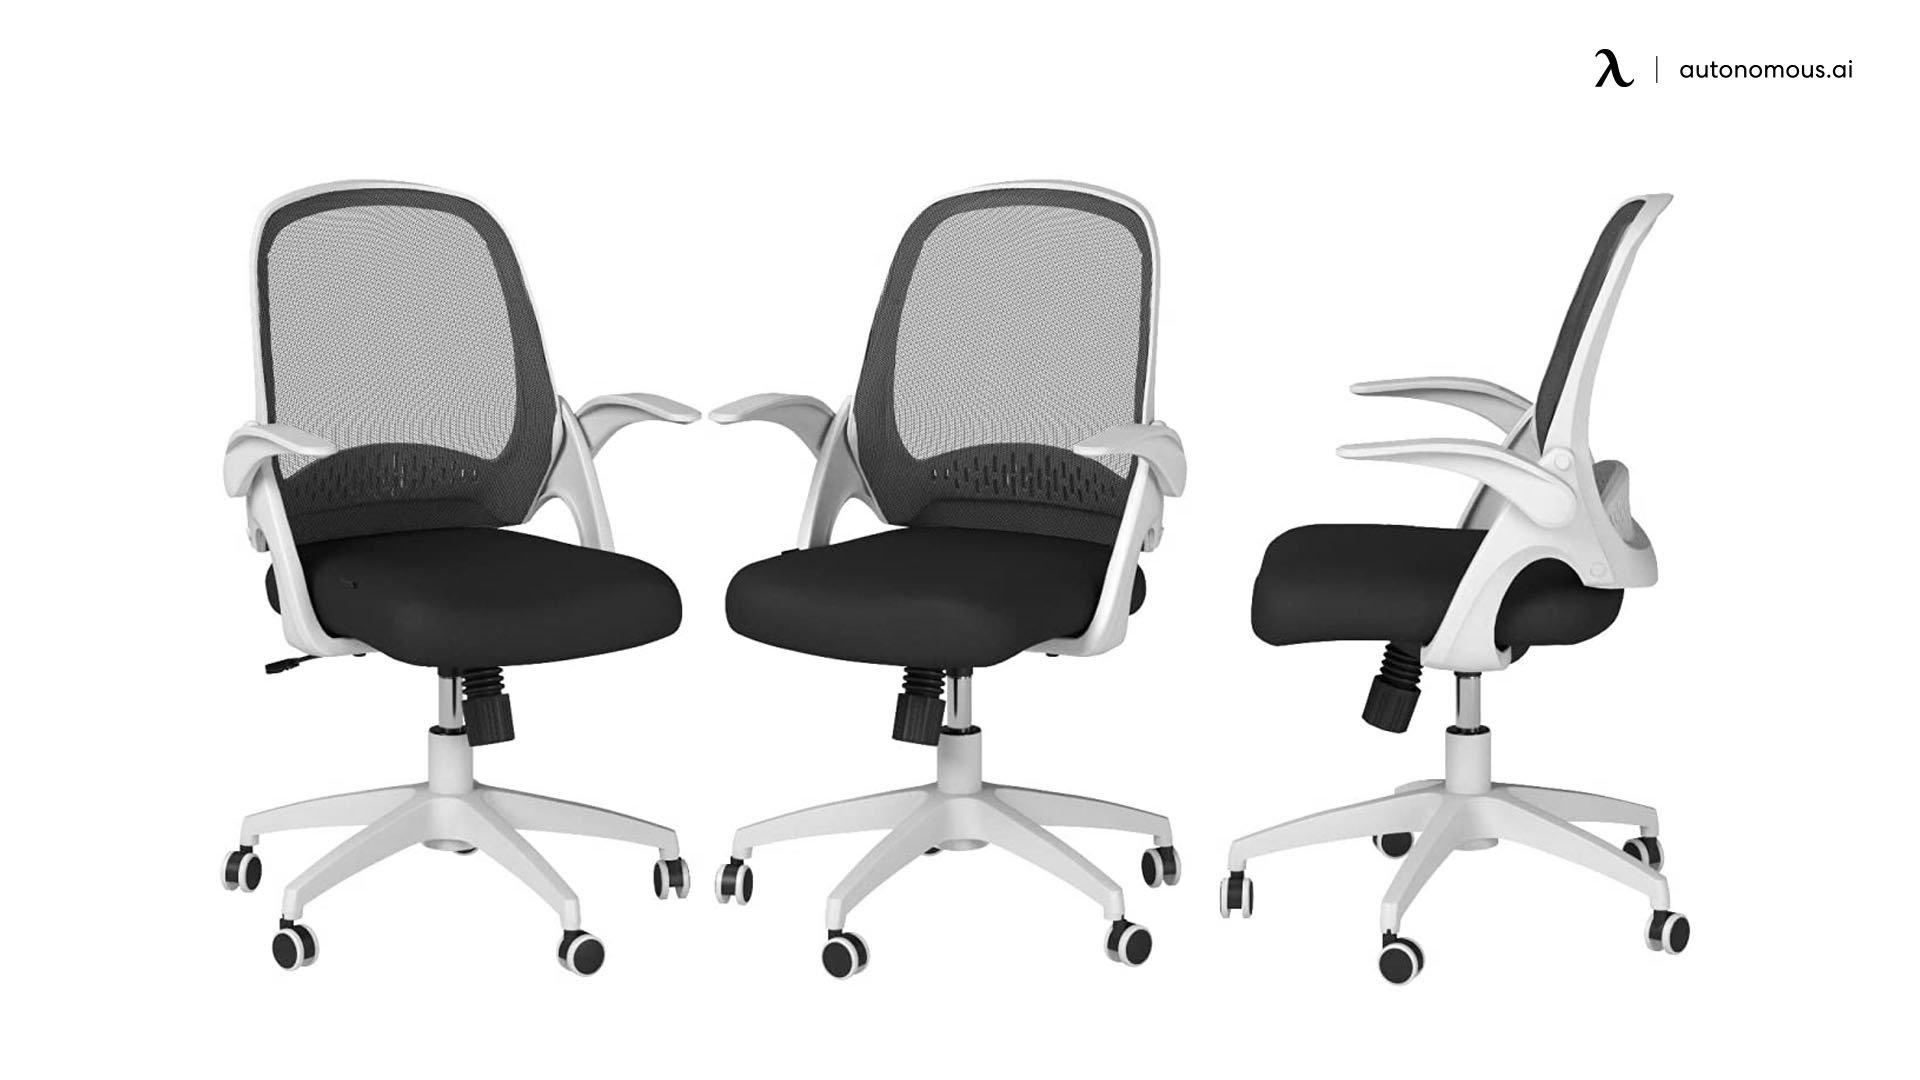 Hbada Flip Up Arms Chair